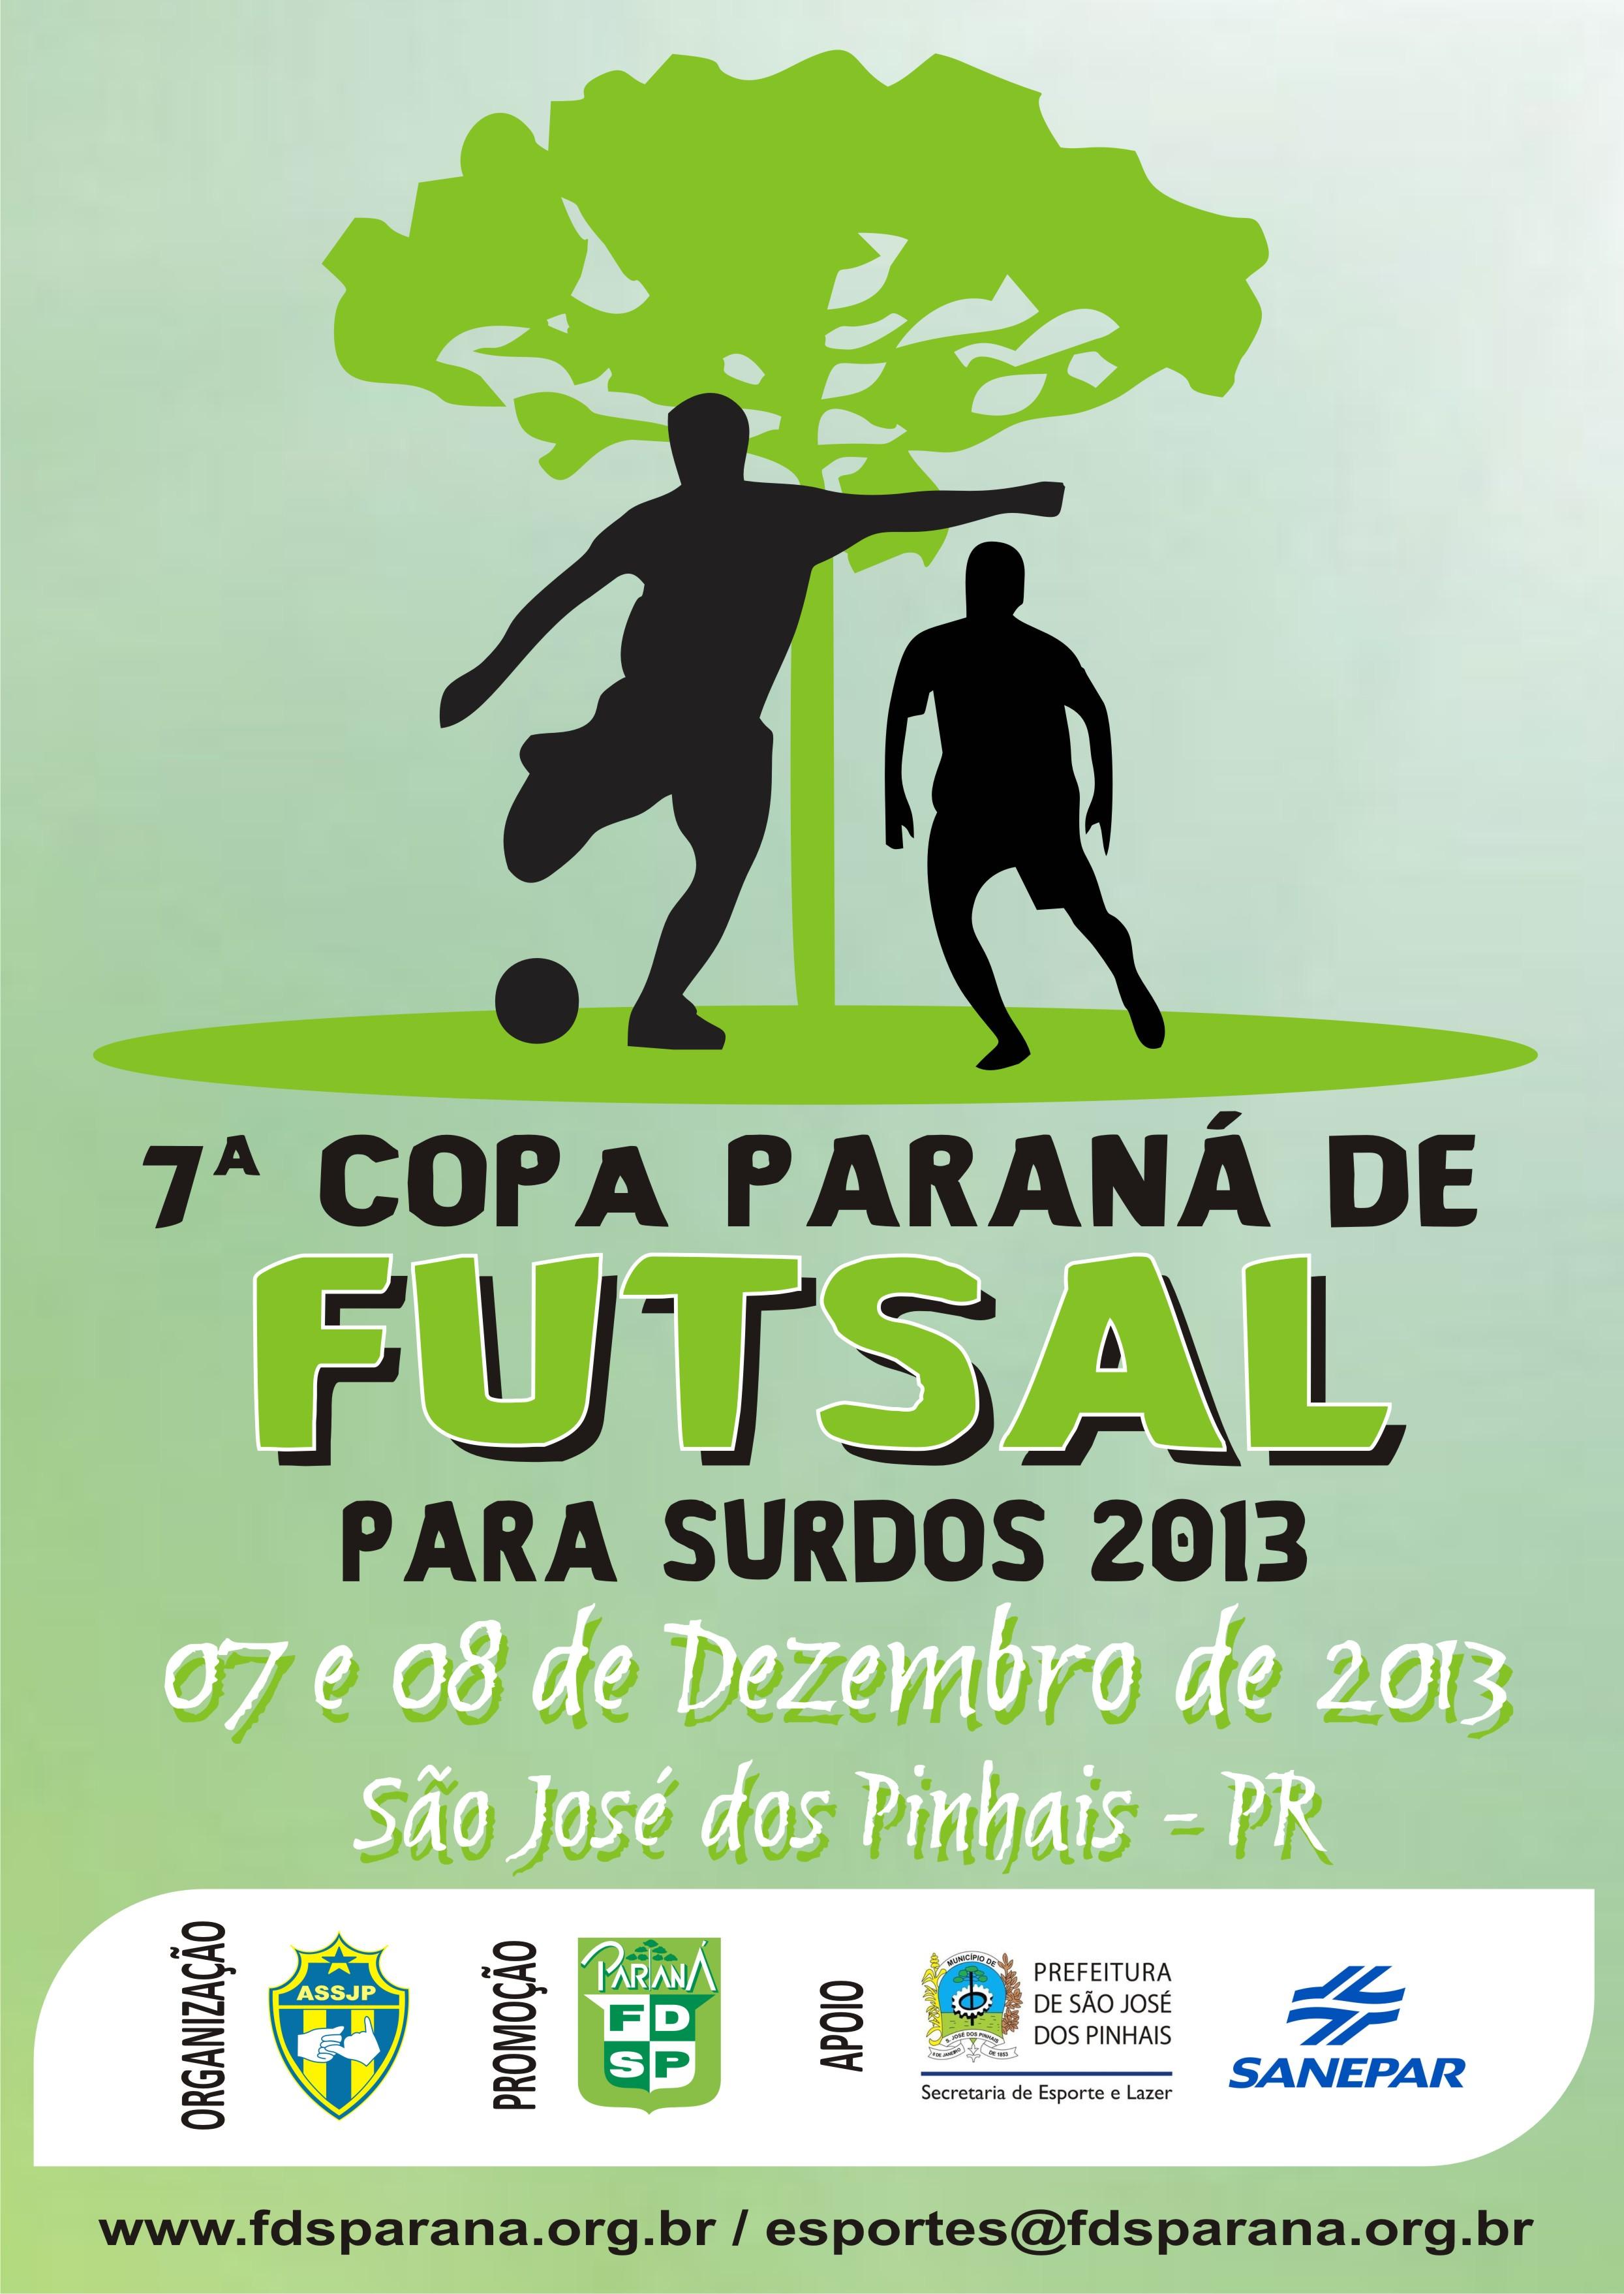 7a Copa Paraná de Futsal 2013 - Final